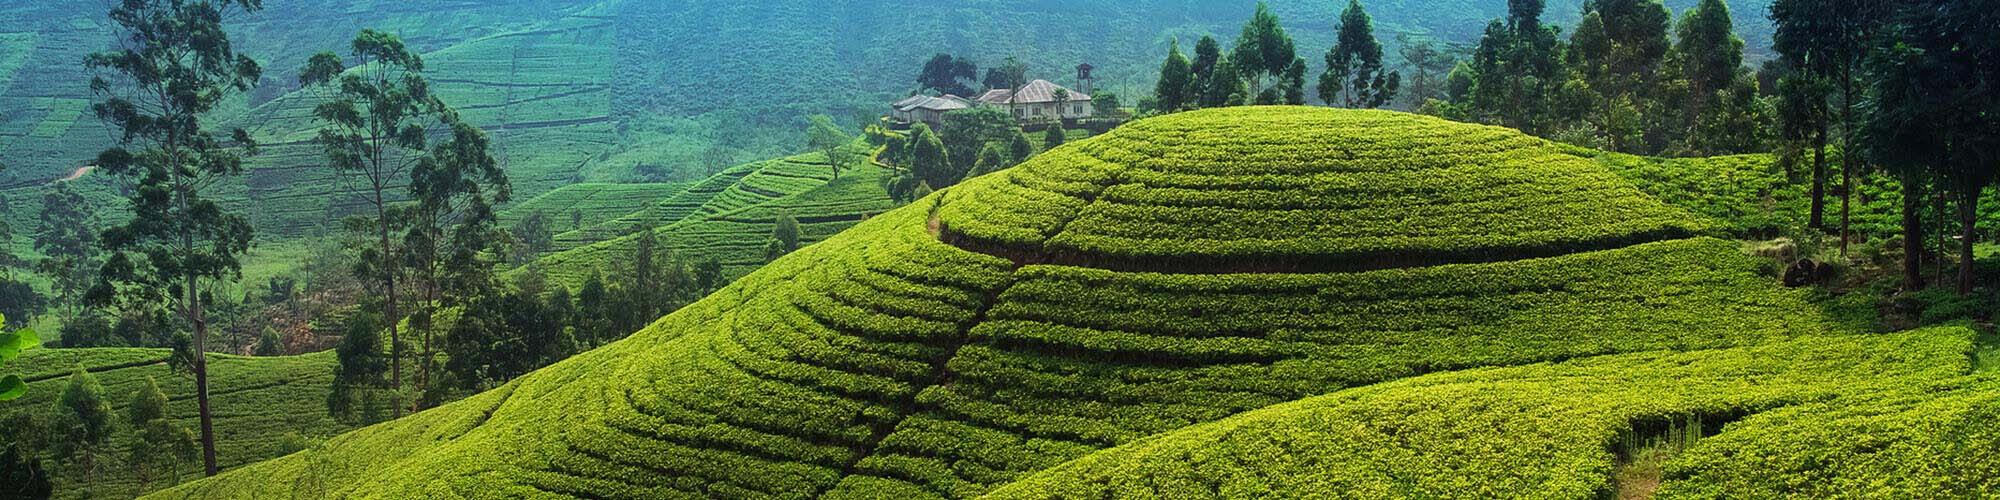 Tea plantations landscape, Sri Lanka